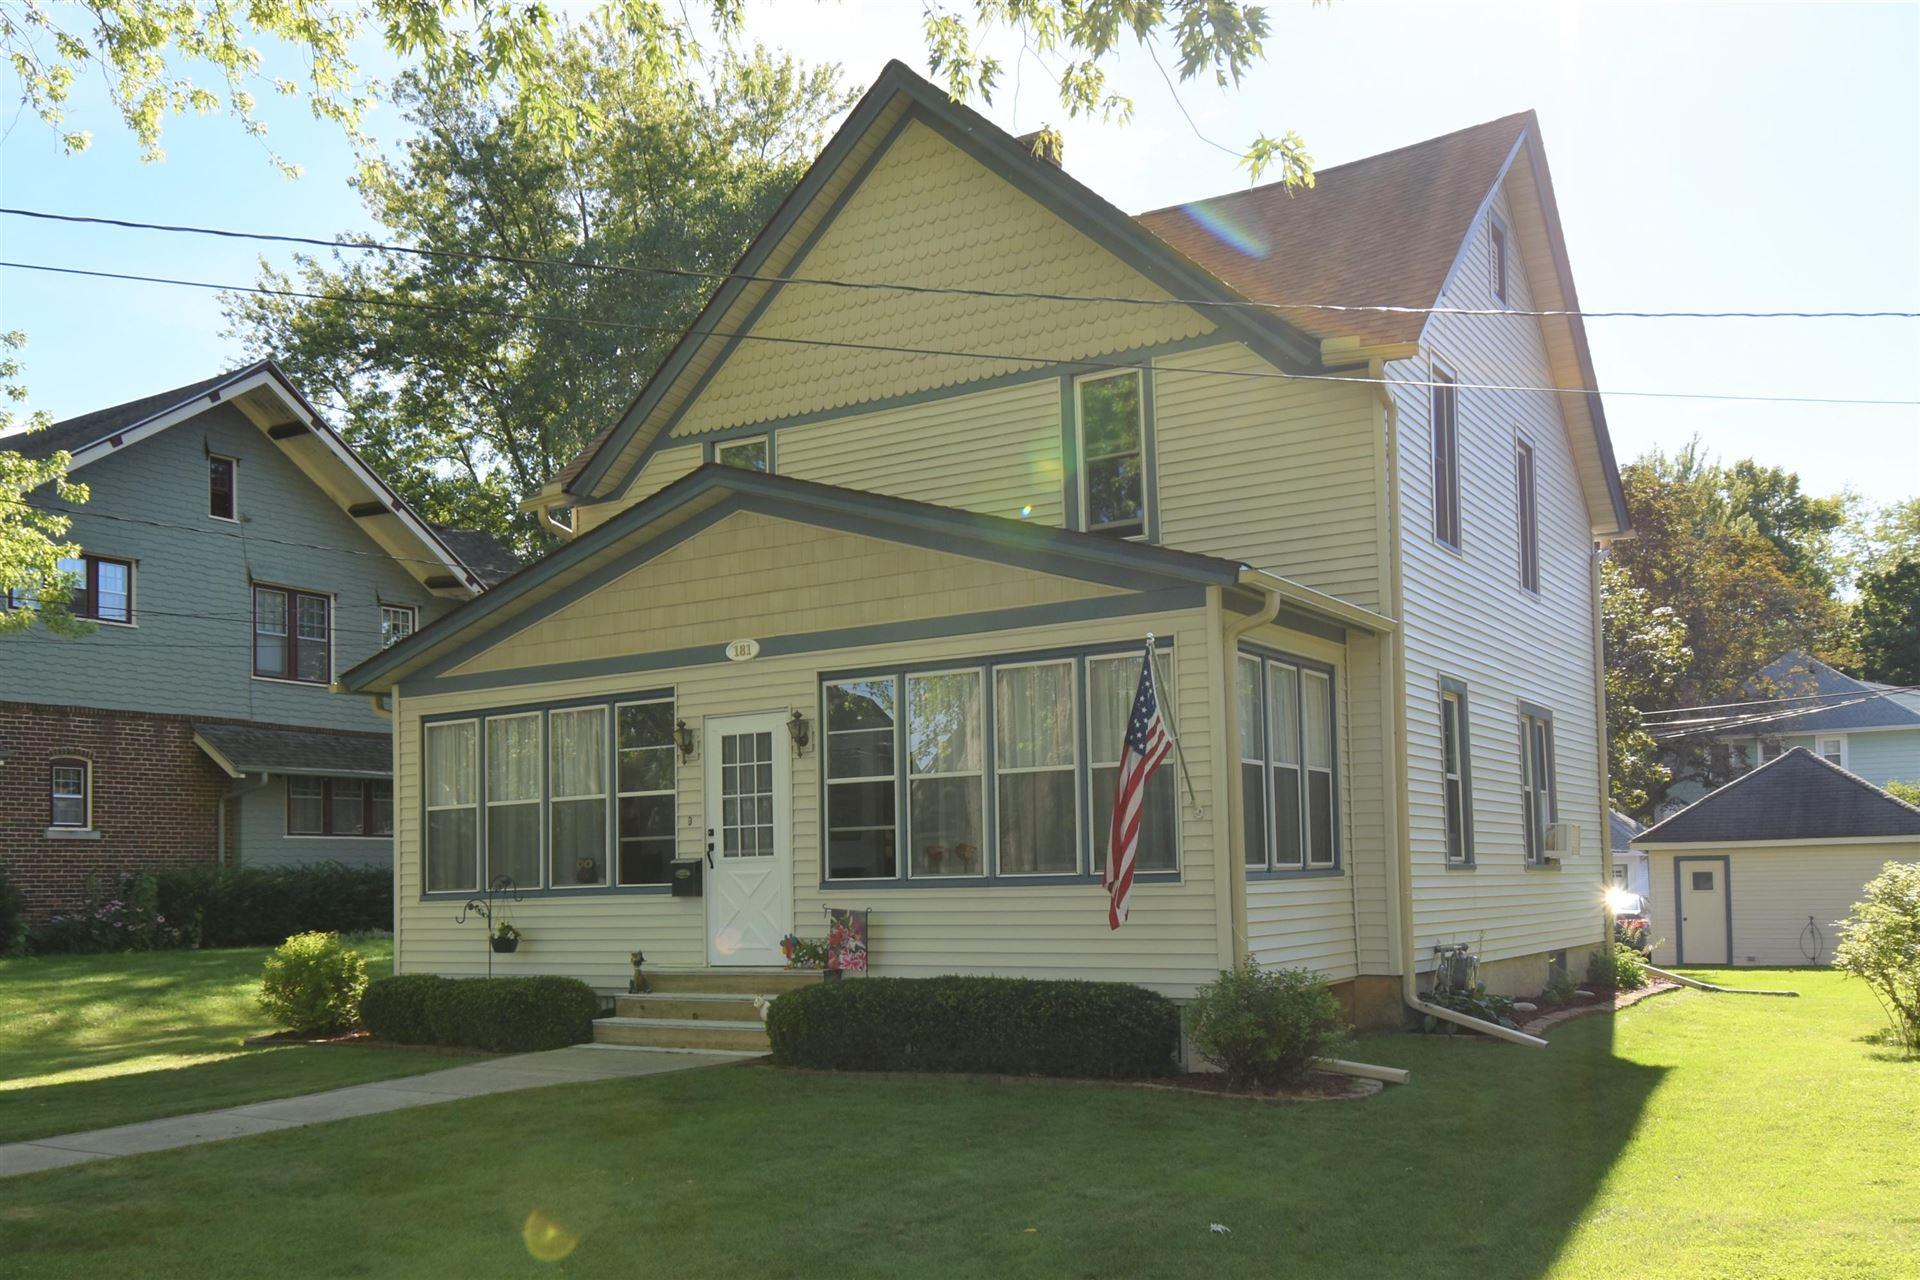 181 Grand Ave, Hartford, WI 53027 - #: 1703965